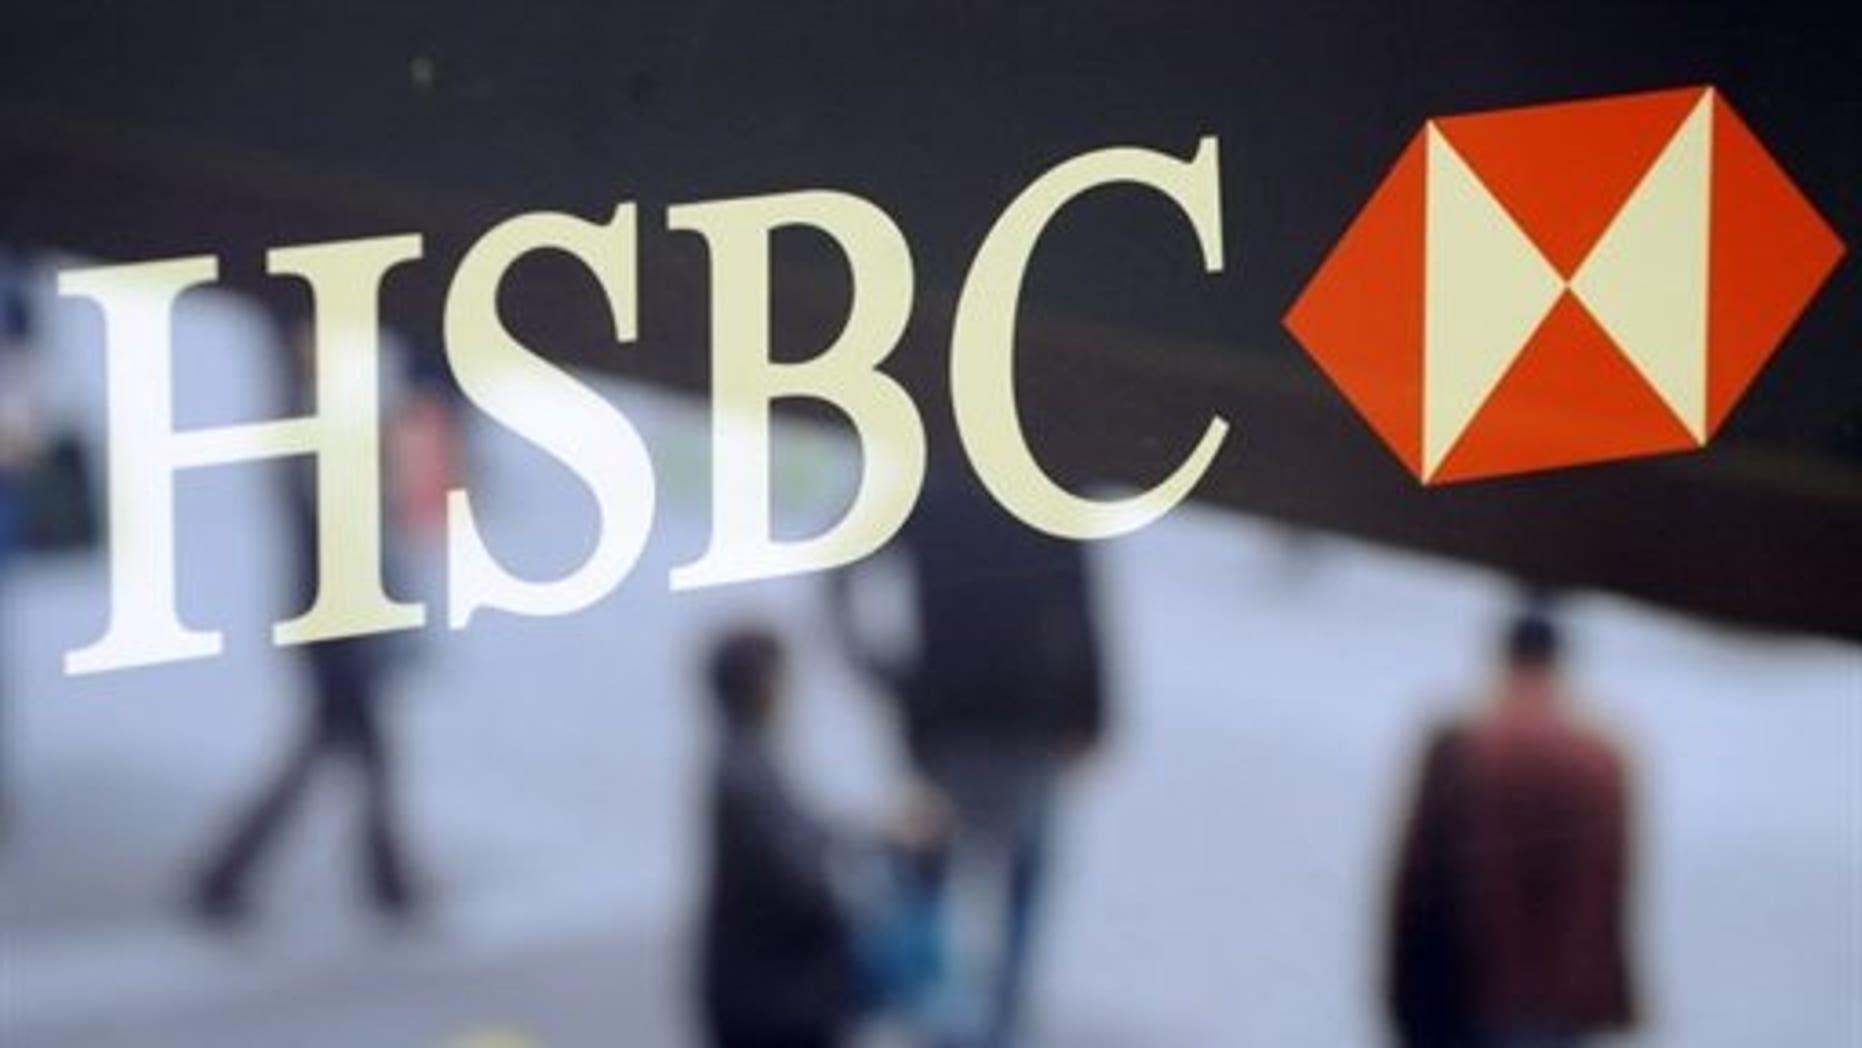 HSBC shares fall after half-year profit report | Fox News